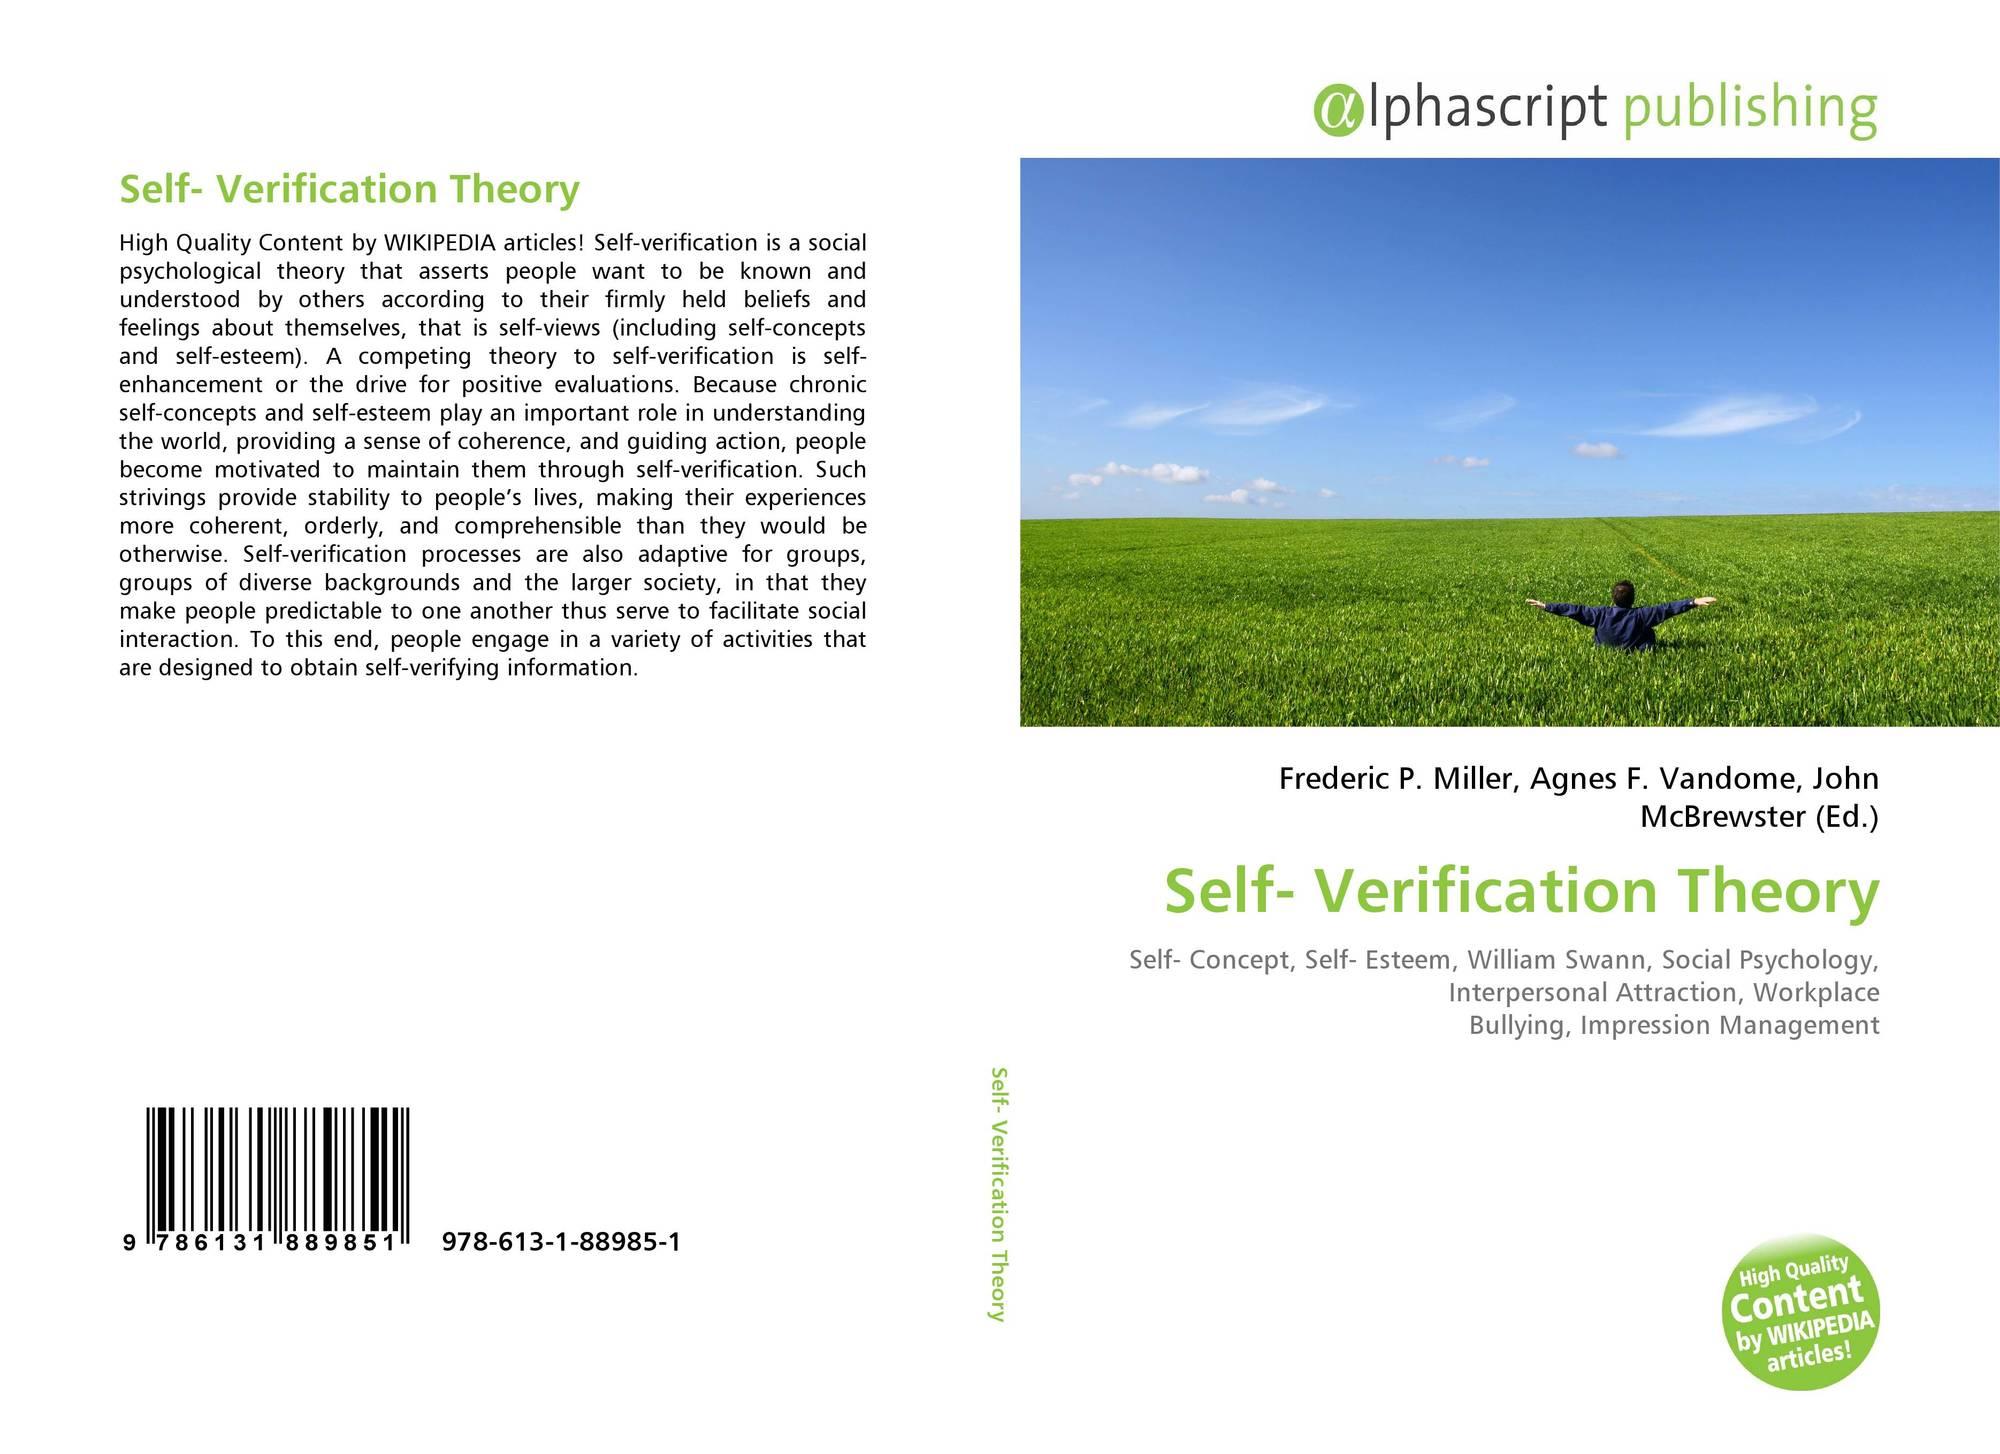 self esteem and impression management